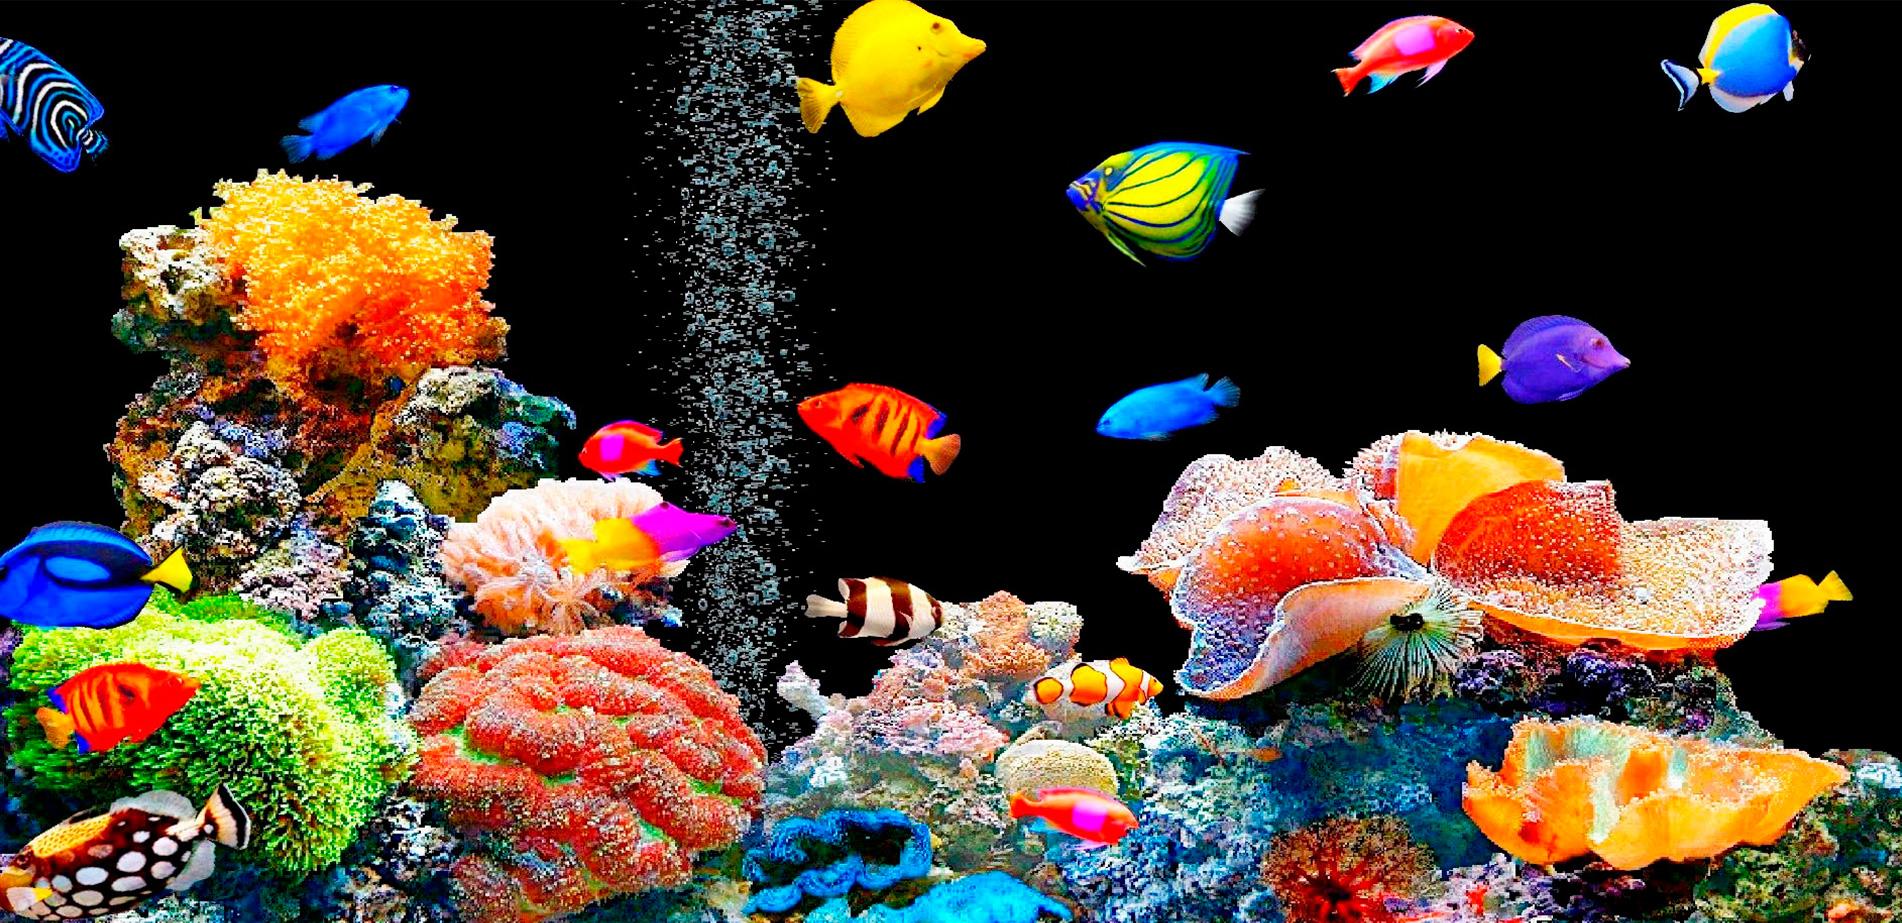 Оформление и заселение аквариумов в Молдове, Кишиневе